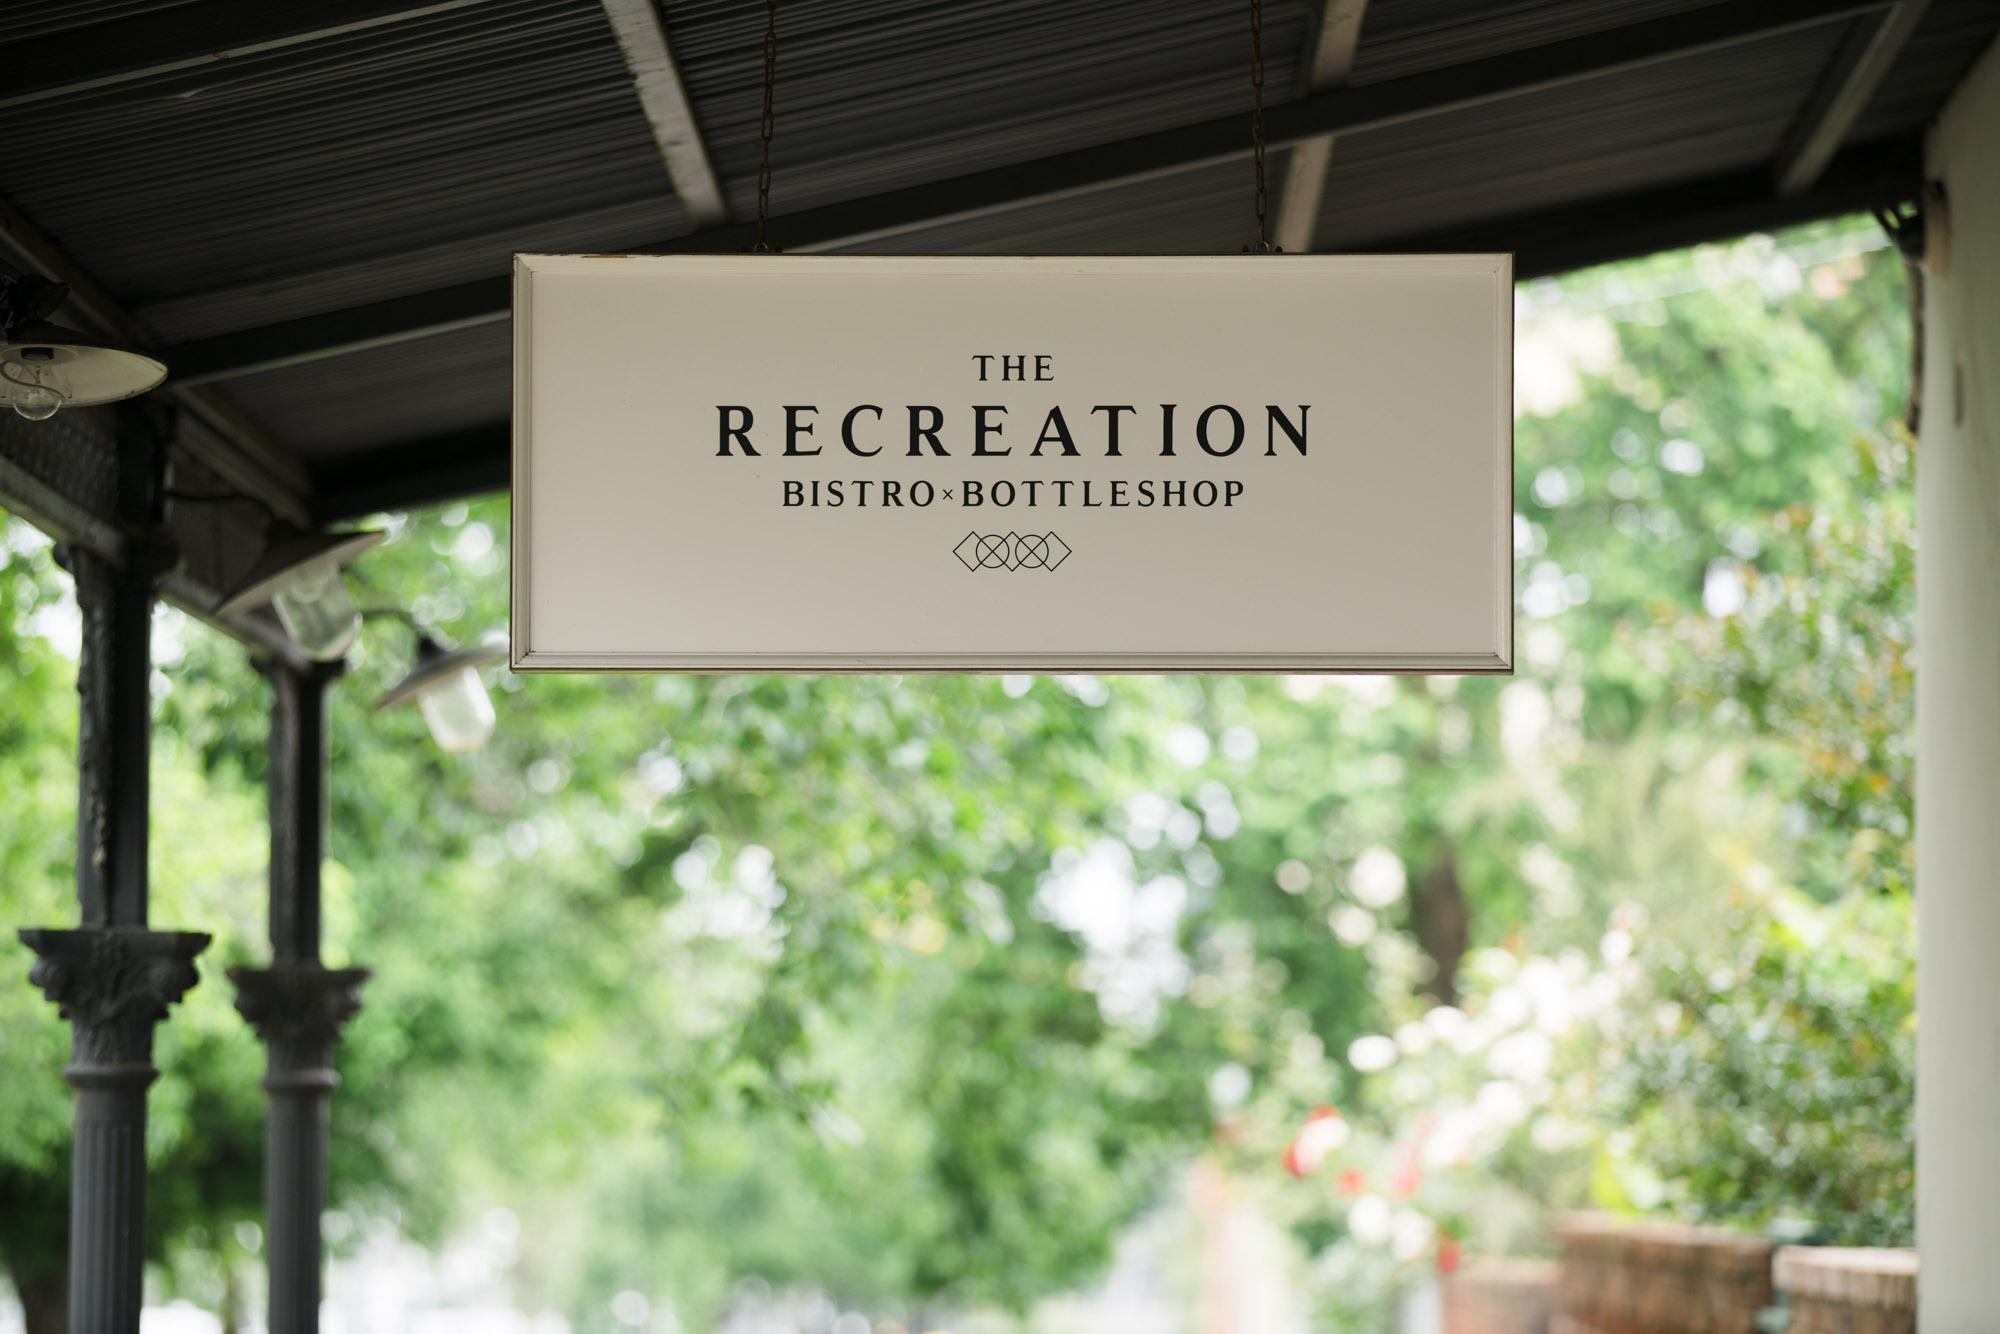 069 The Recreation - 7743.jpg